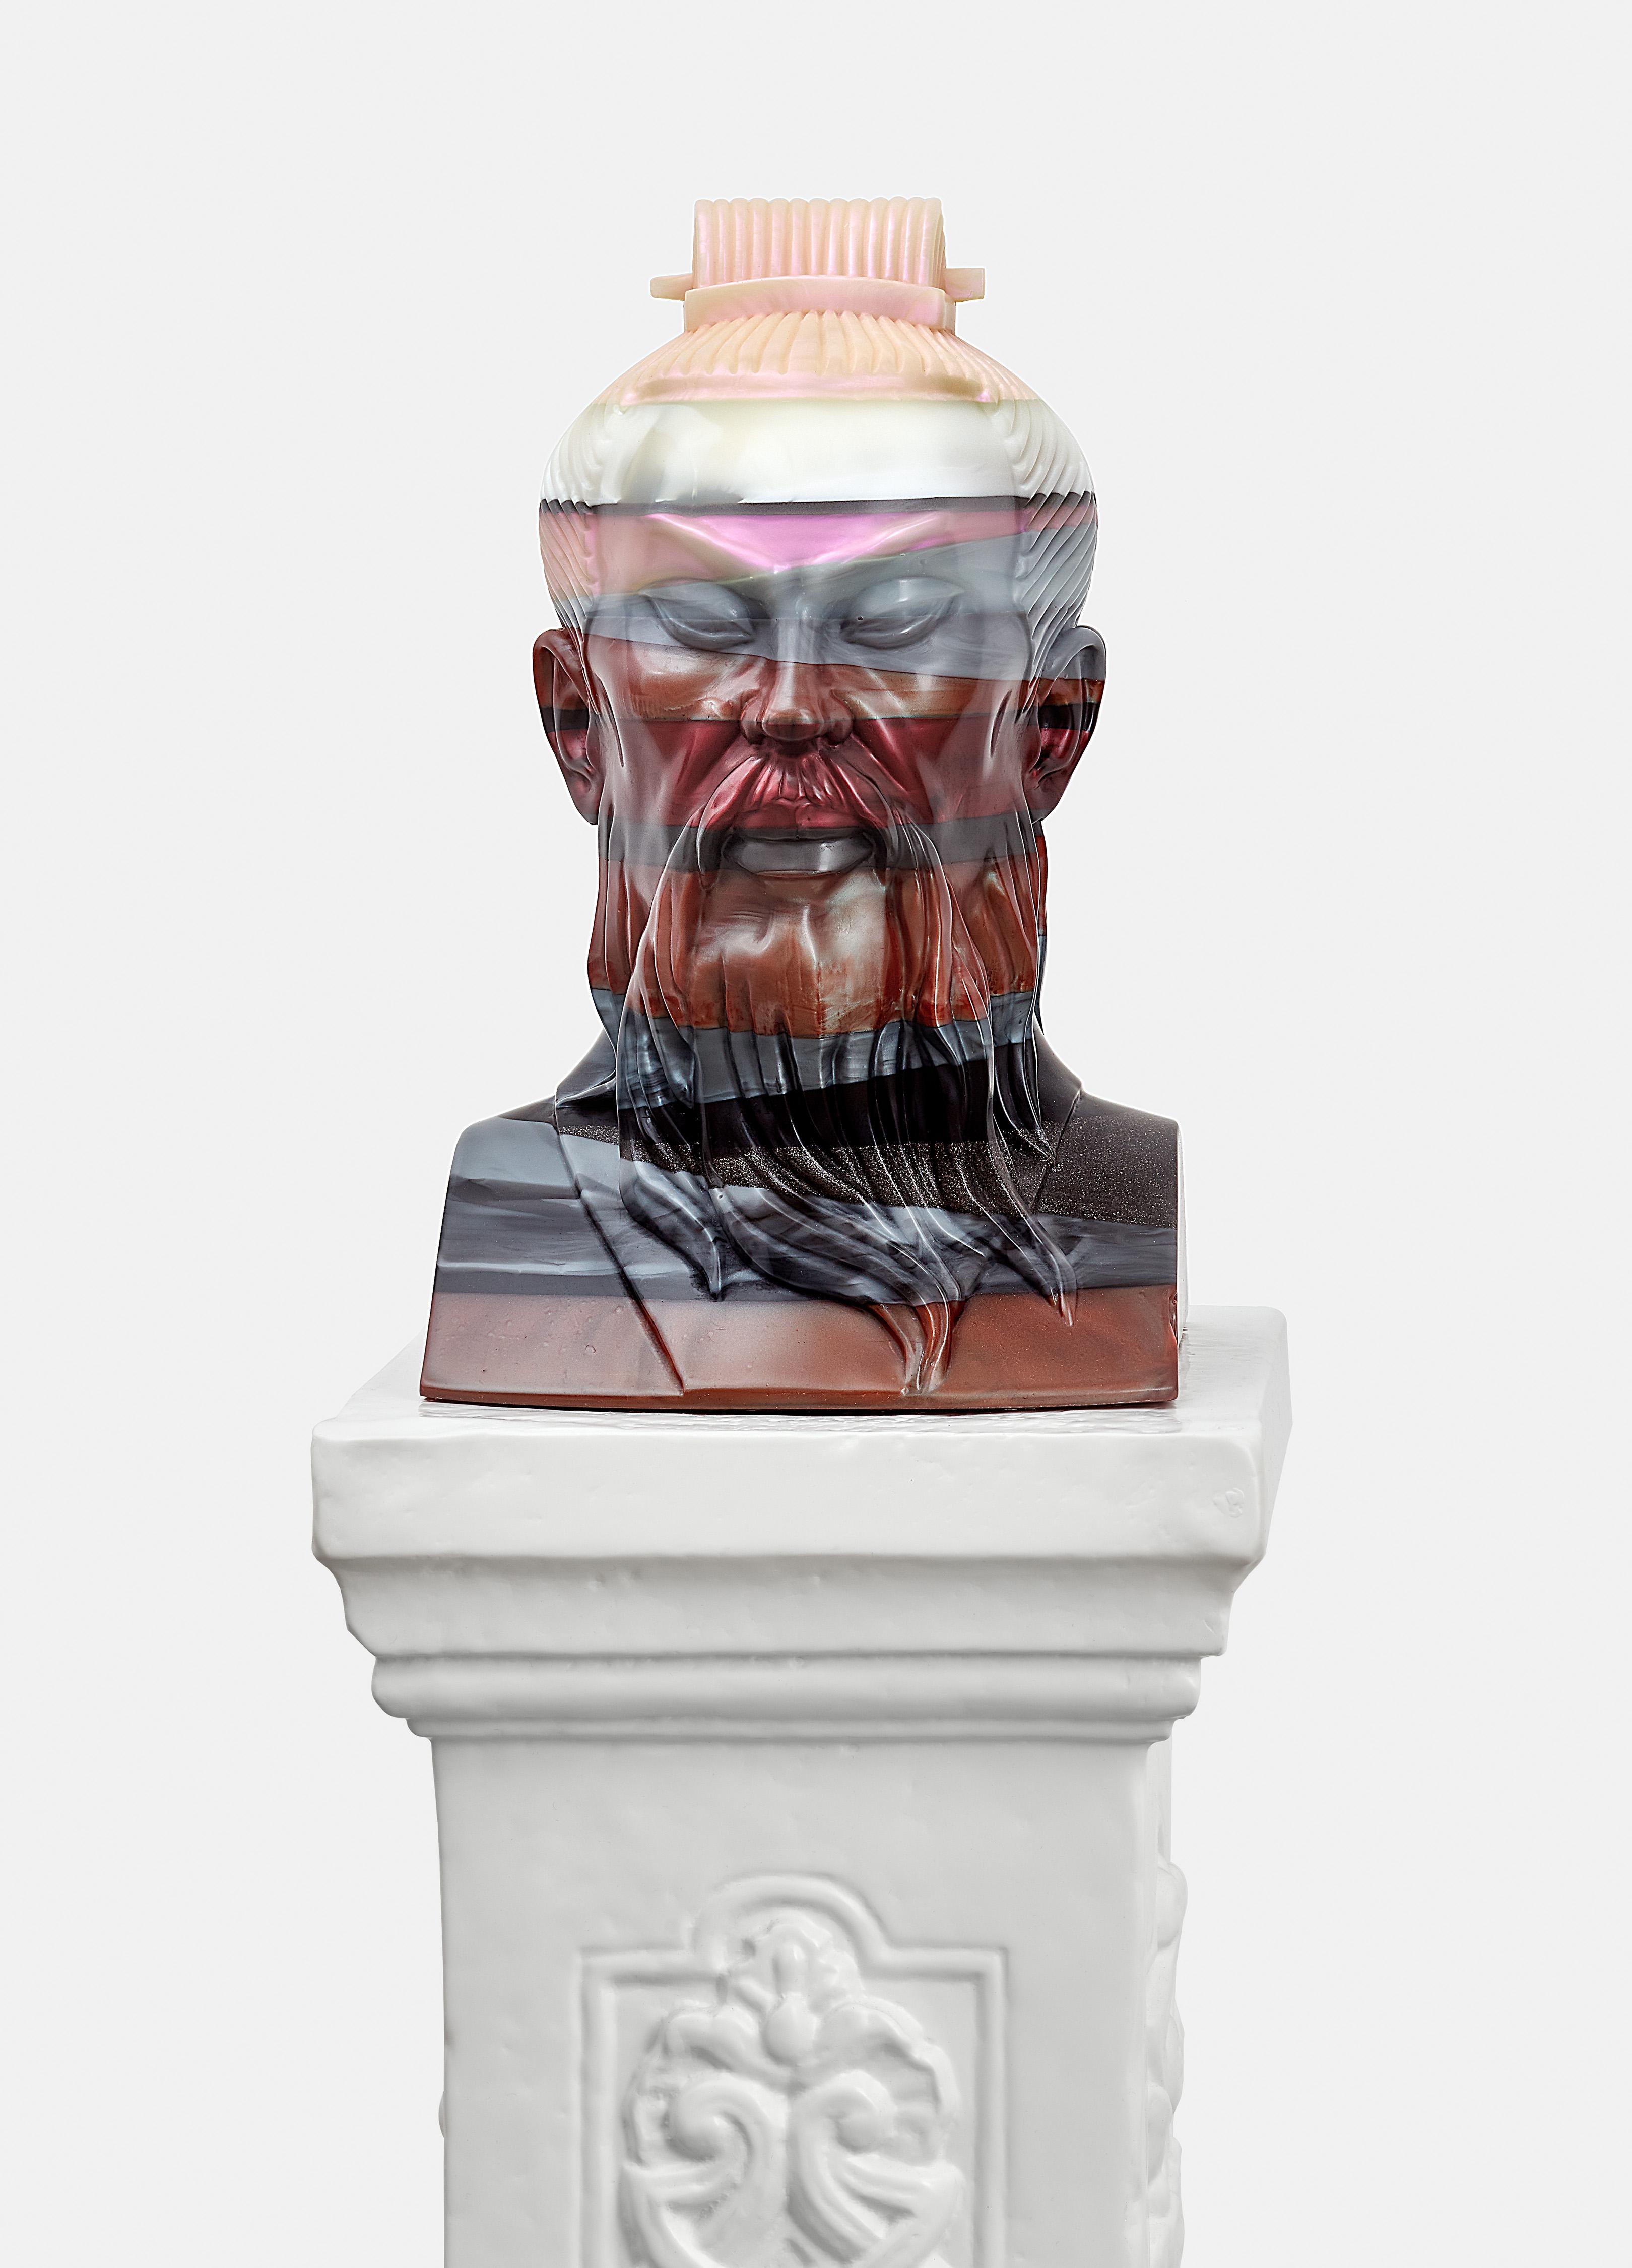 Oliver Laric, Sun Tzu Janus (detail), 2018. Courtesy of the artist and Tanya Leighton, Berlin